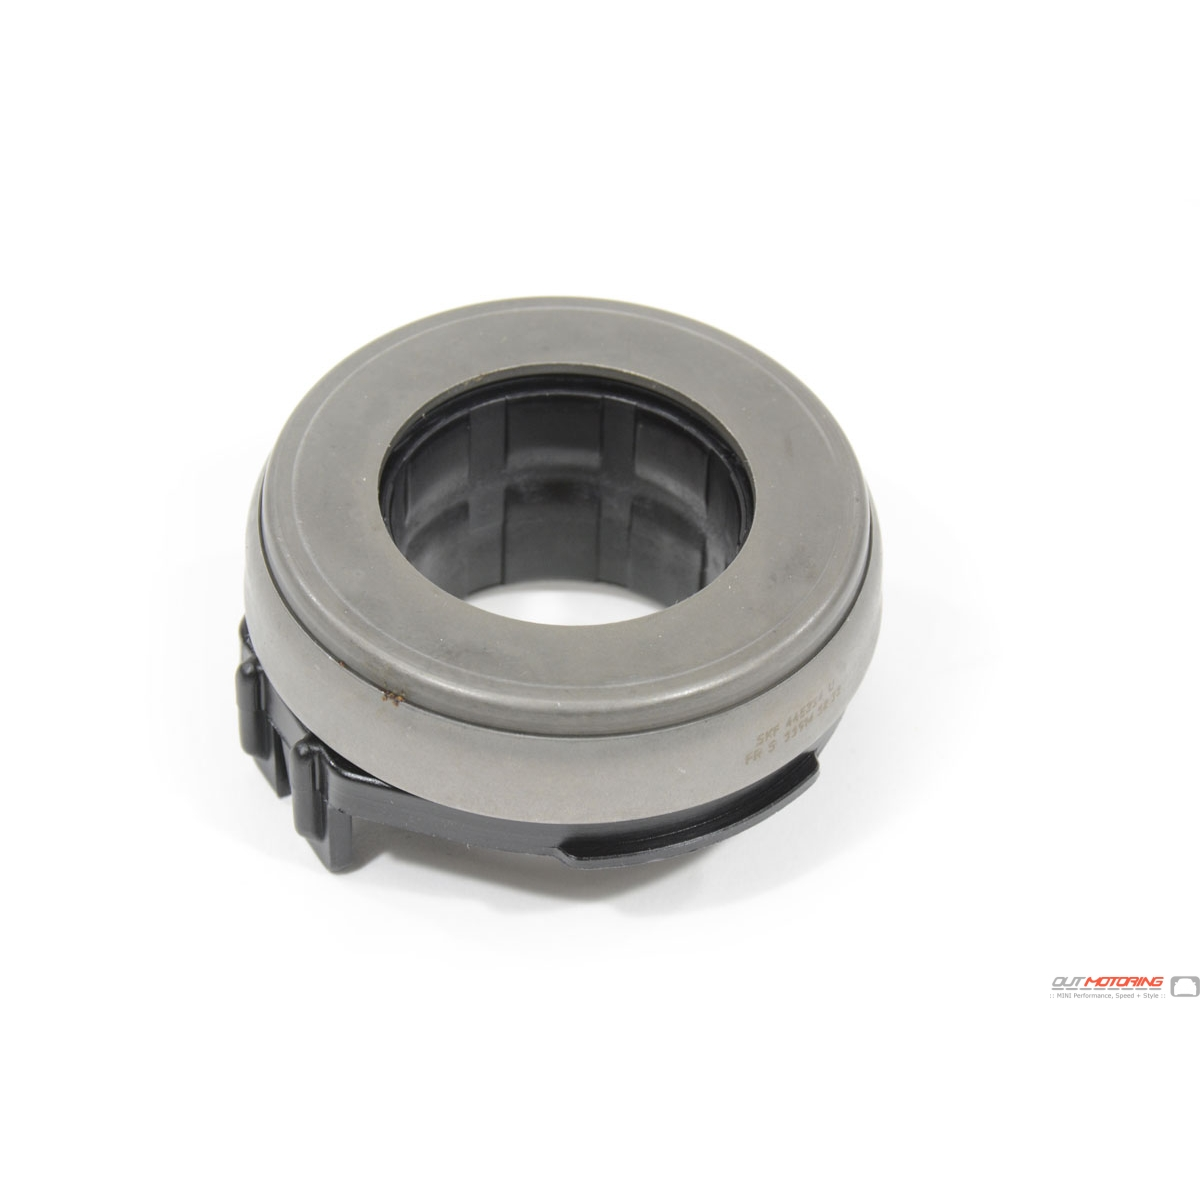 MINI Cooper Replacement Clutch Release Bearing 21517547077